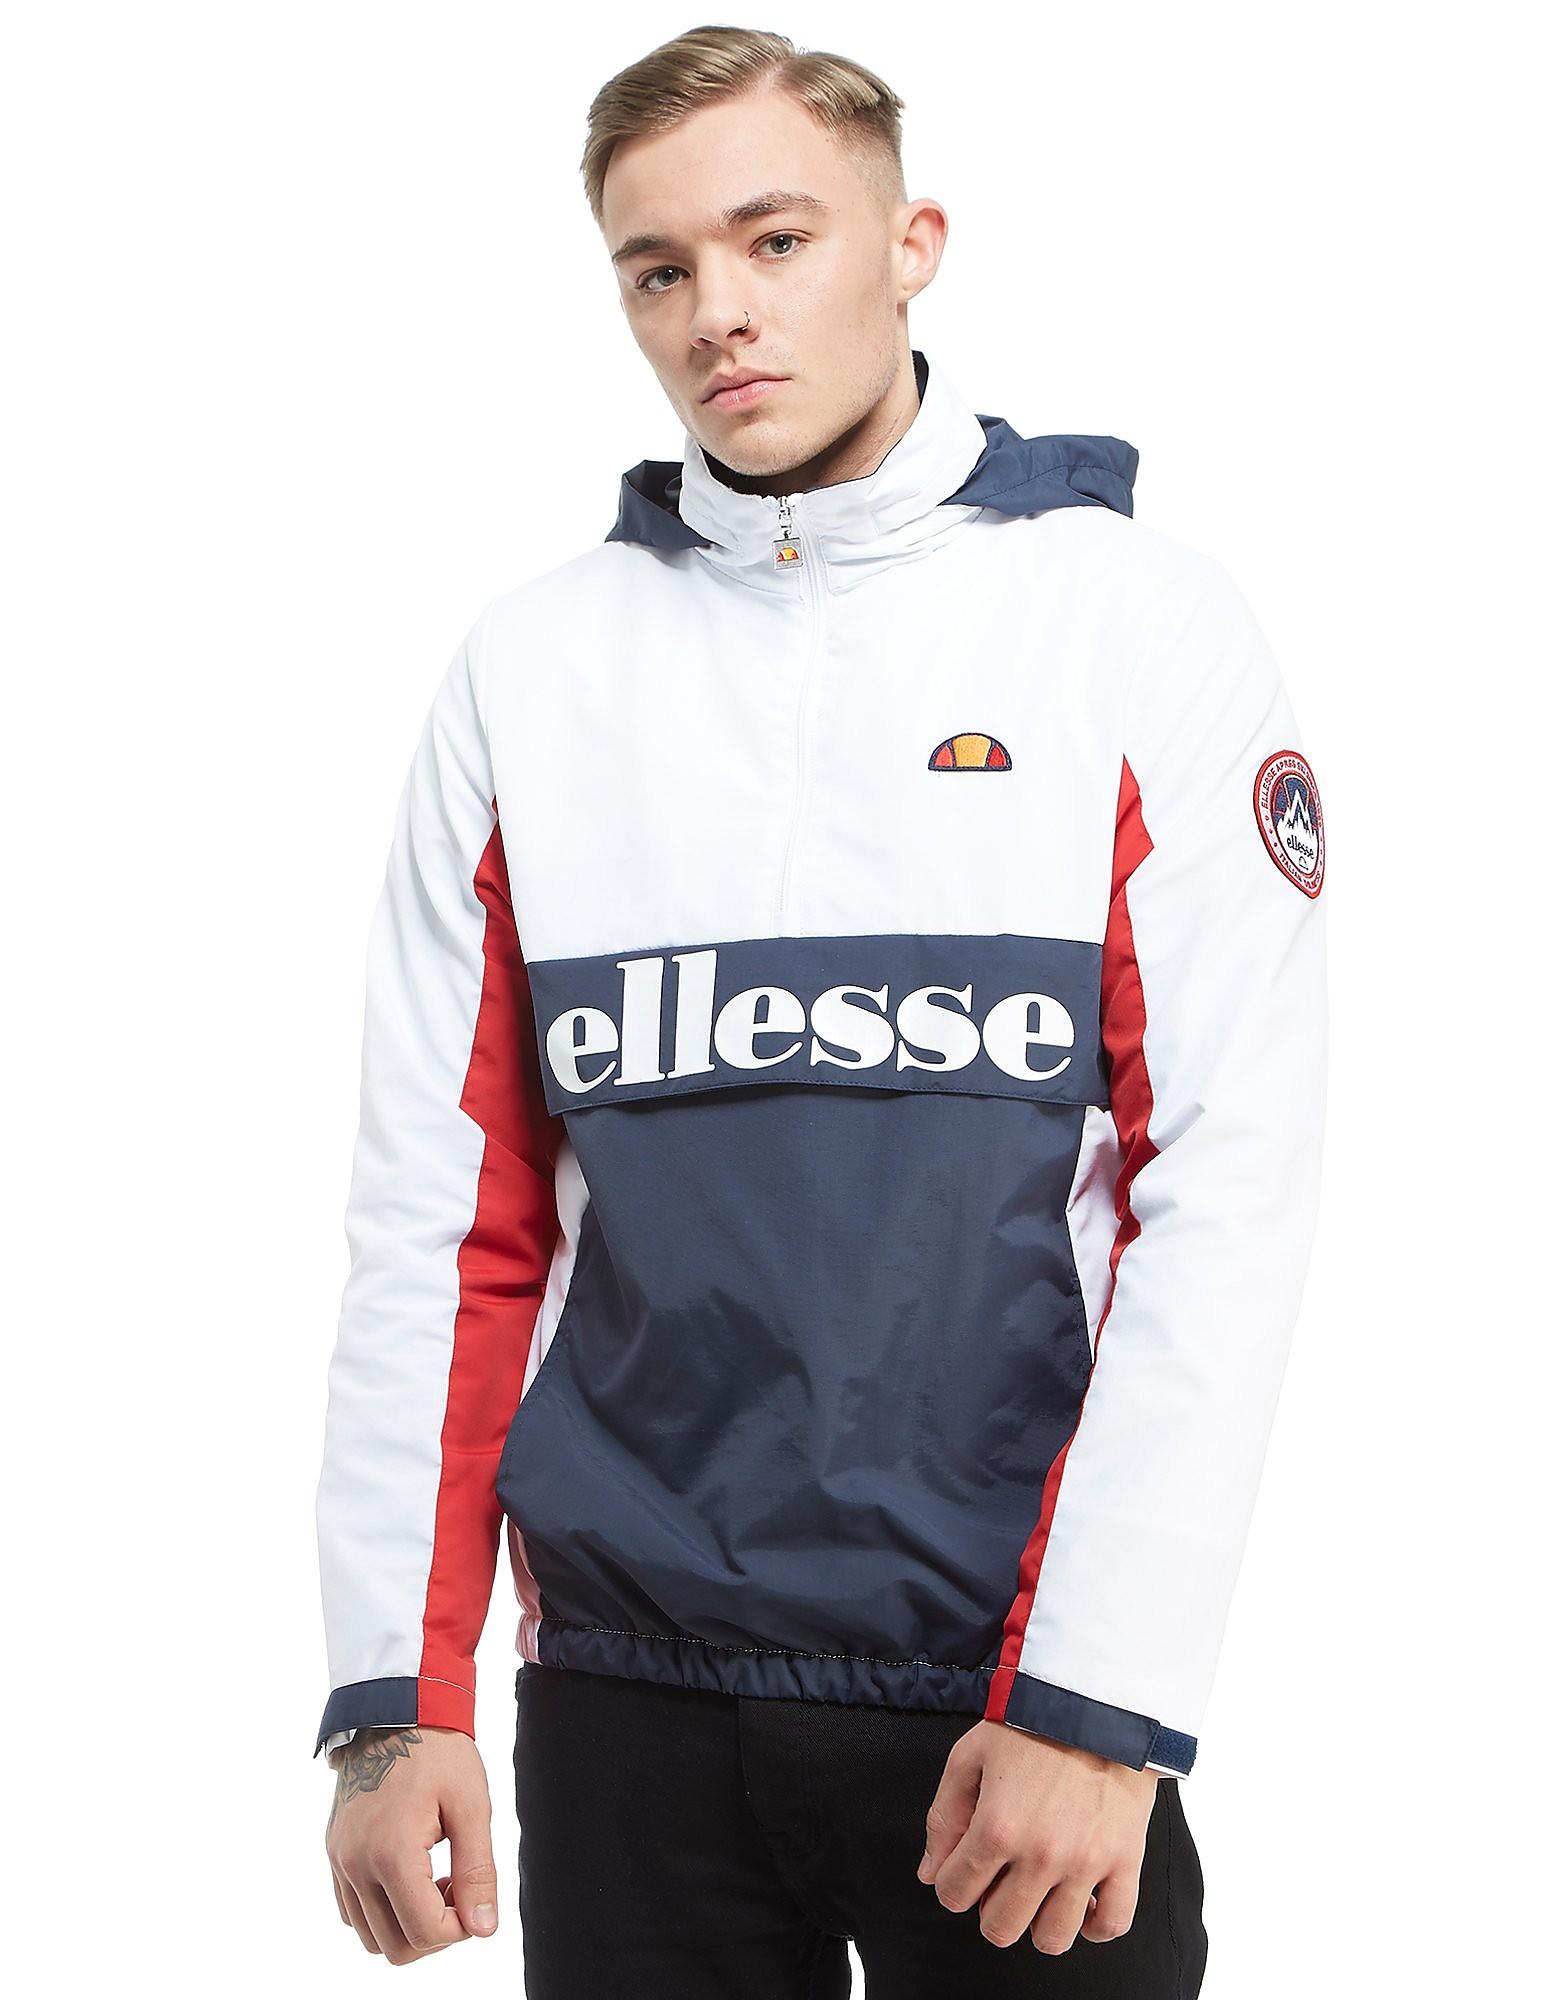 Ellesse Abetone Ski Fleece Jacket